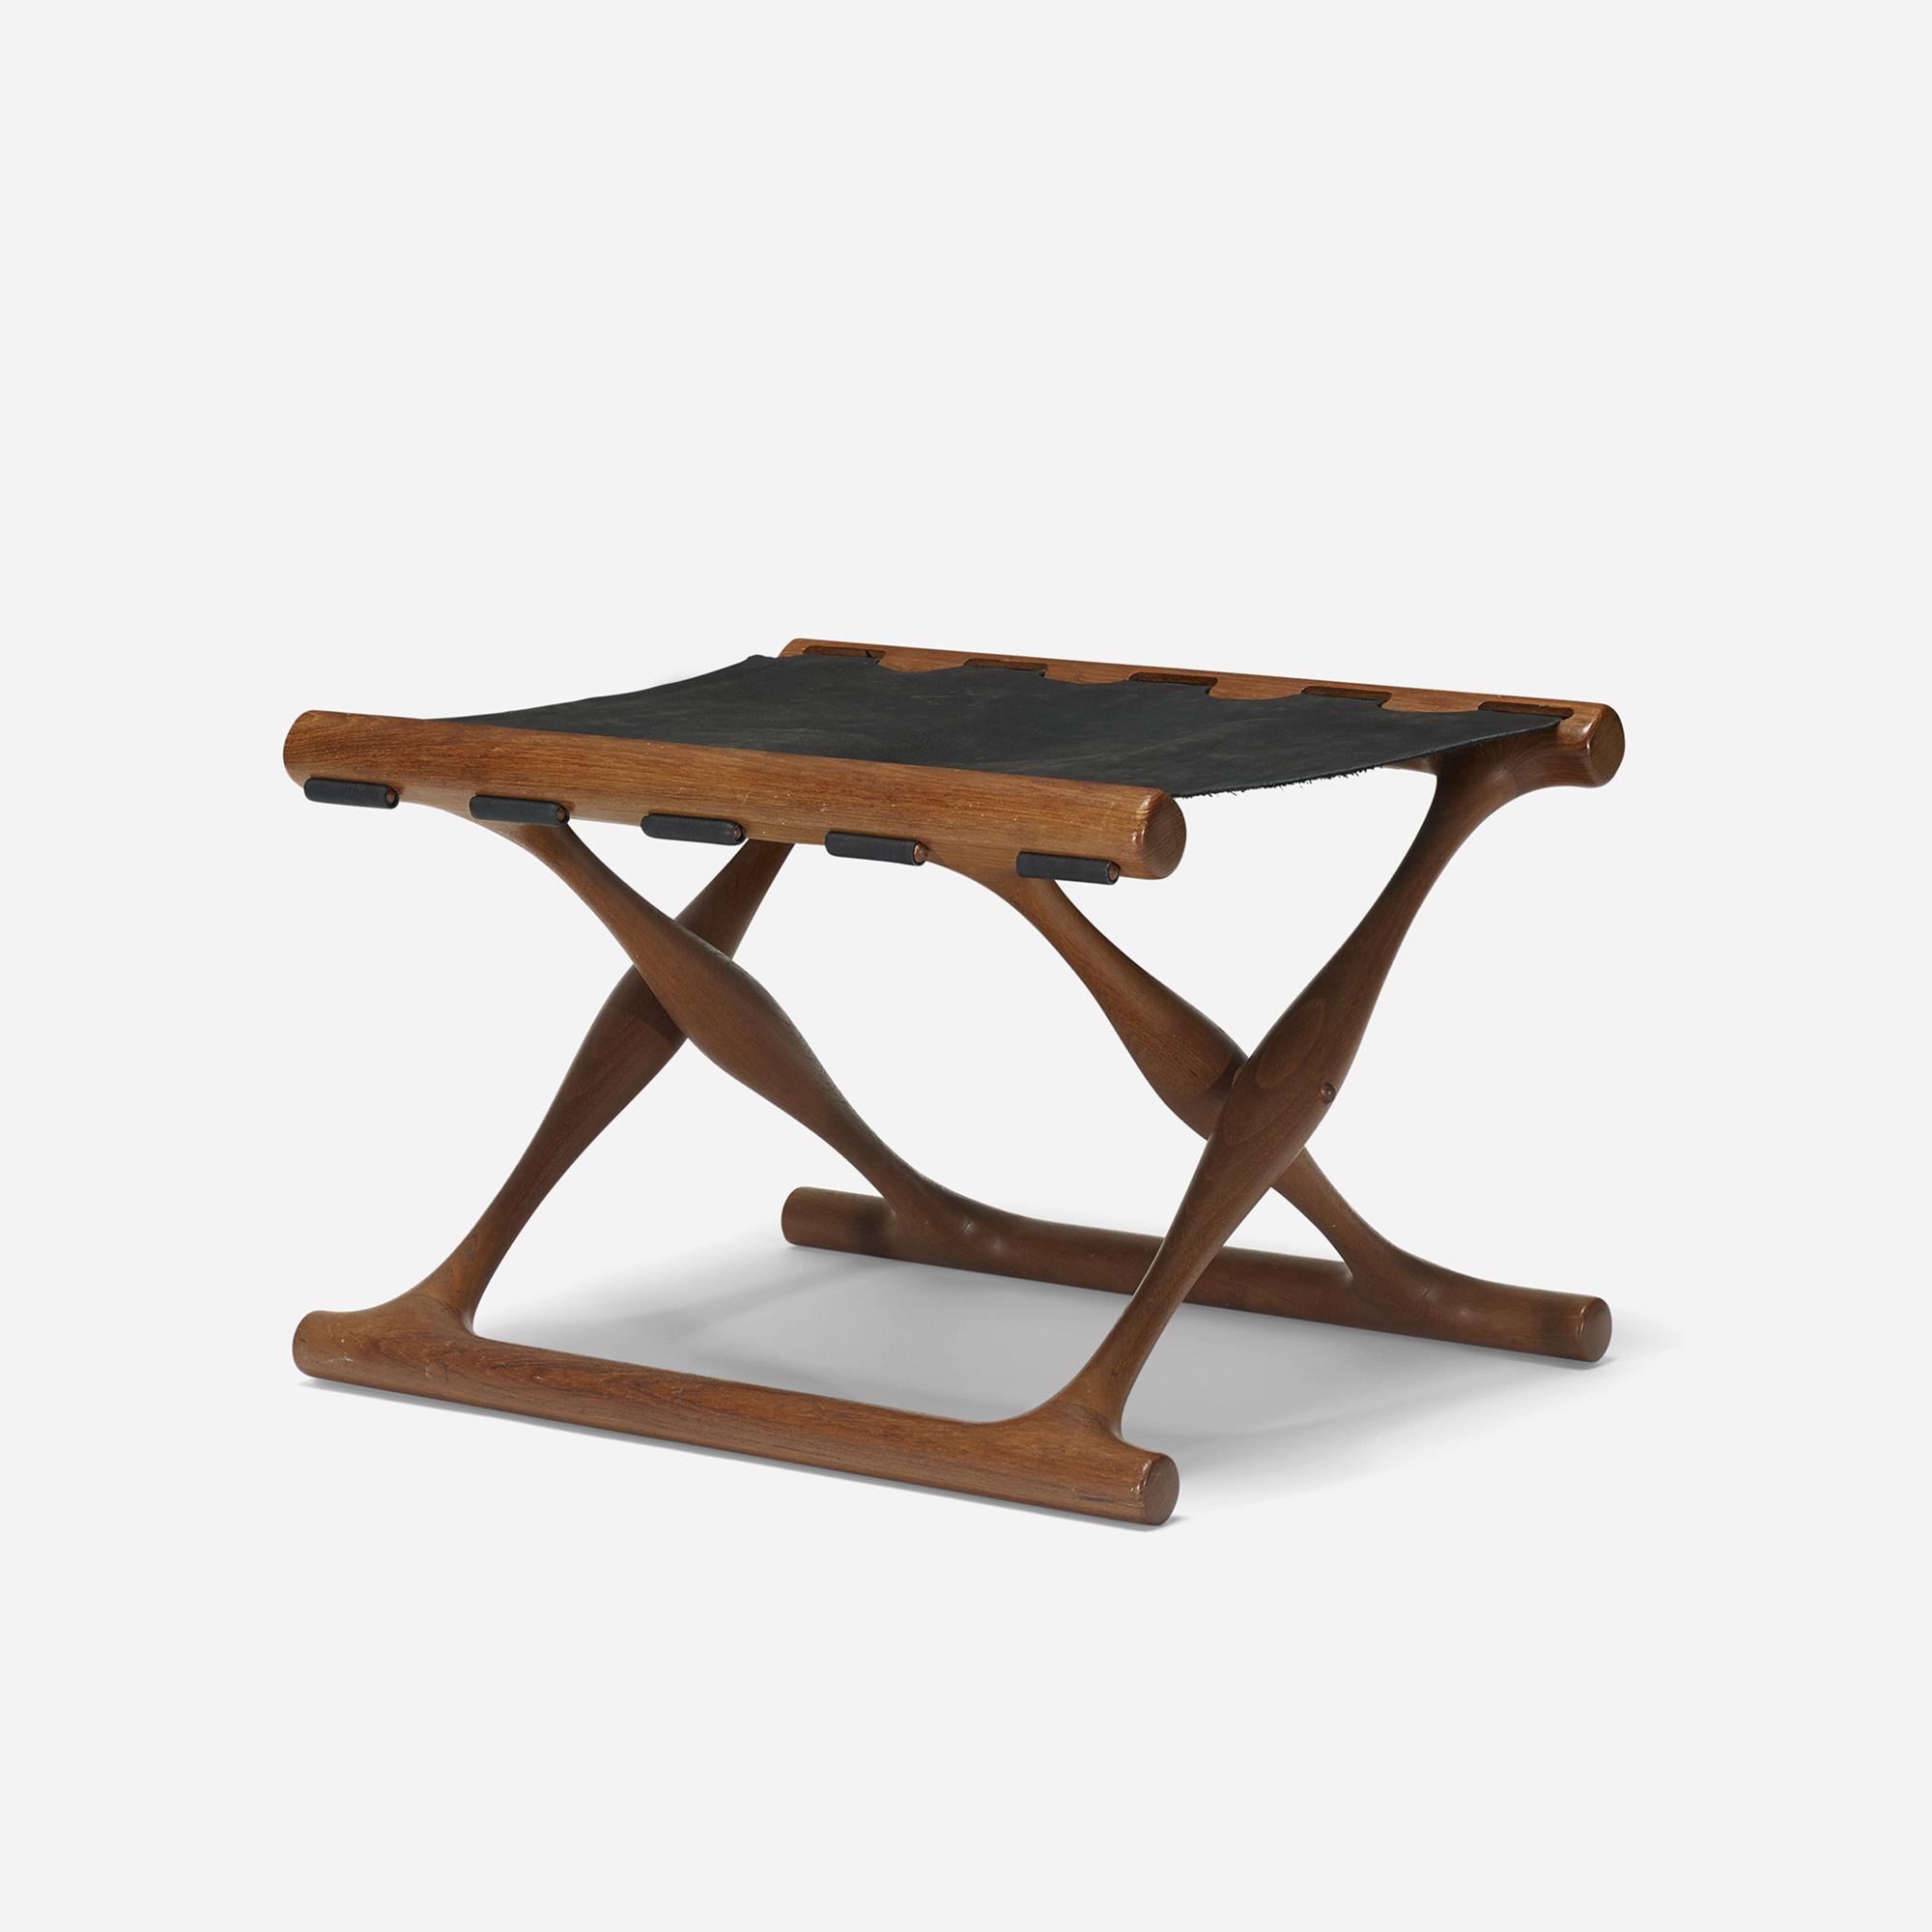 362: Poul Hundevad / Guldhoj folding stool (1 of 3)